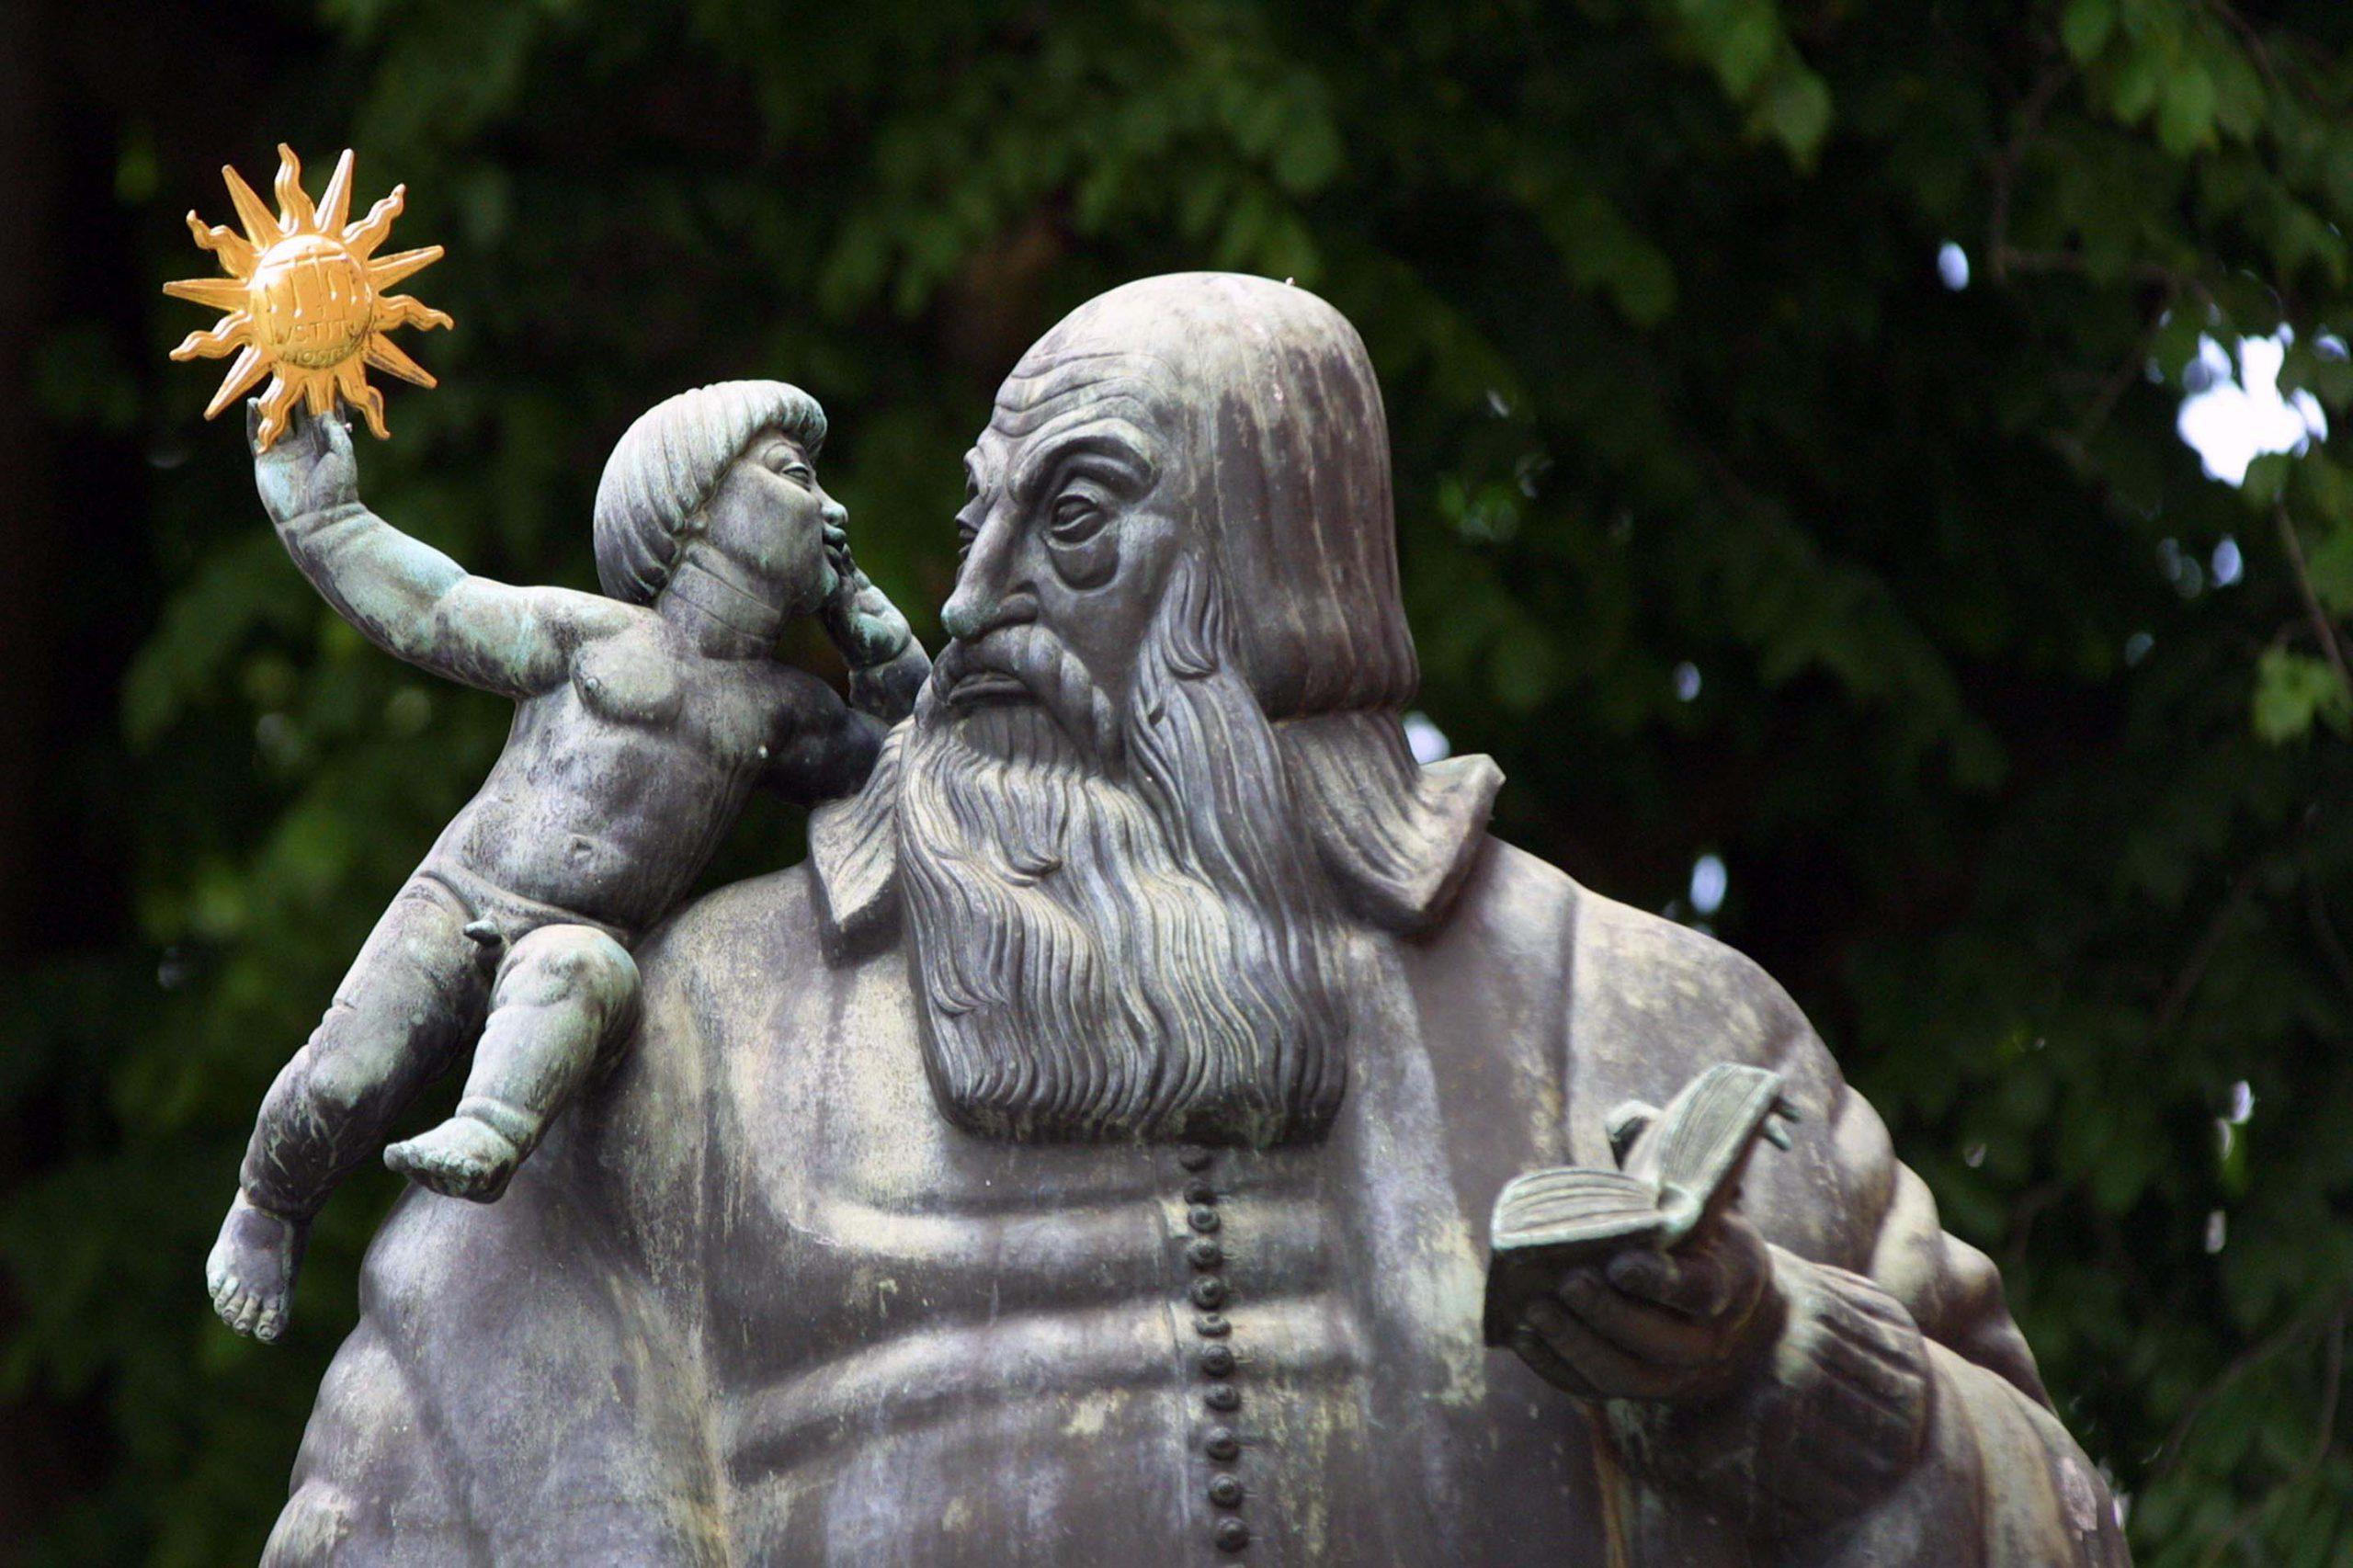 Biskop Johannes Rudbeckius staty. Fotograf: Clifford Shirly